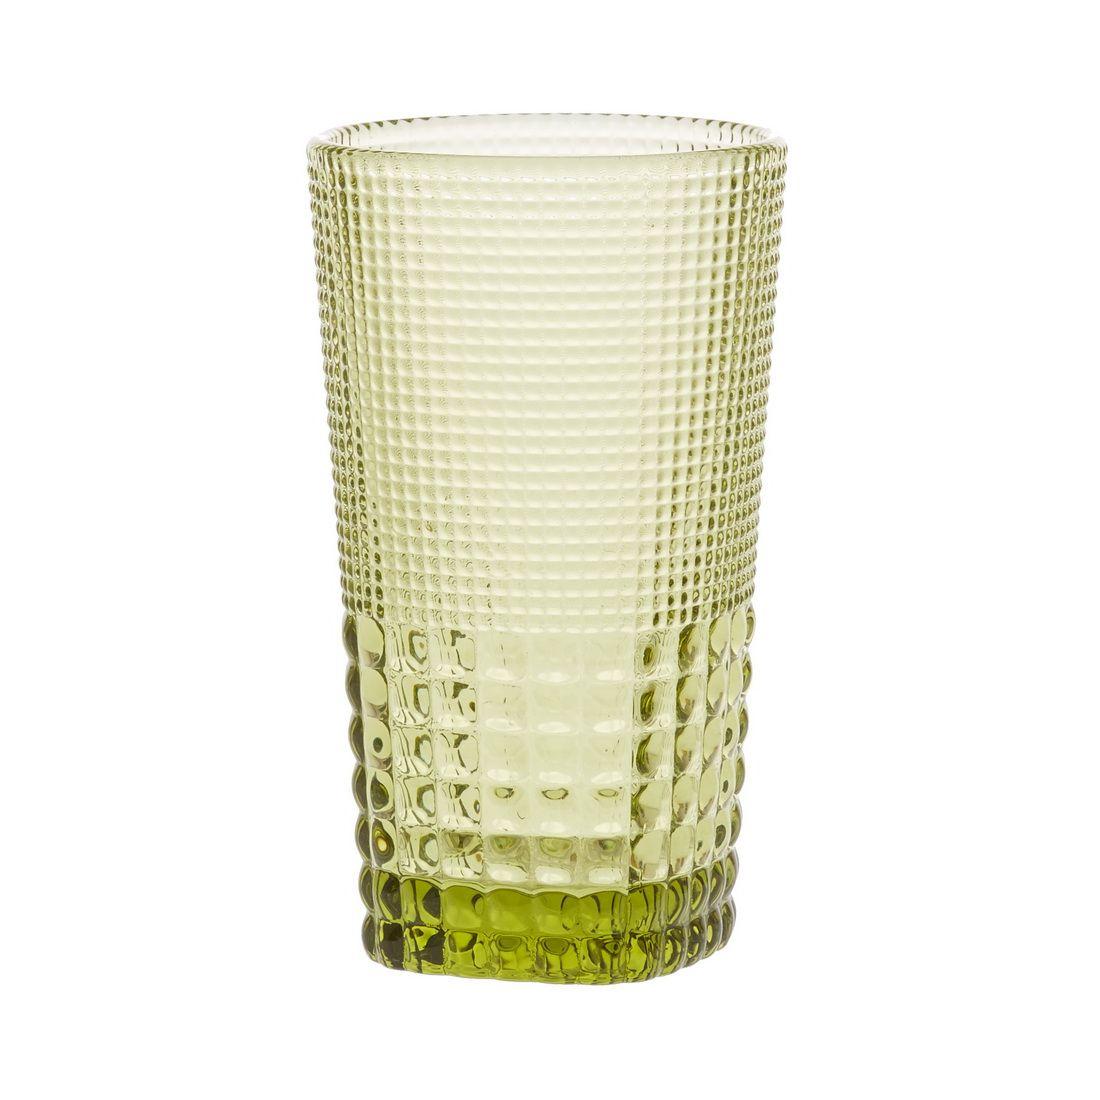 Стакан для напитков Royal drops, оливковый<br>